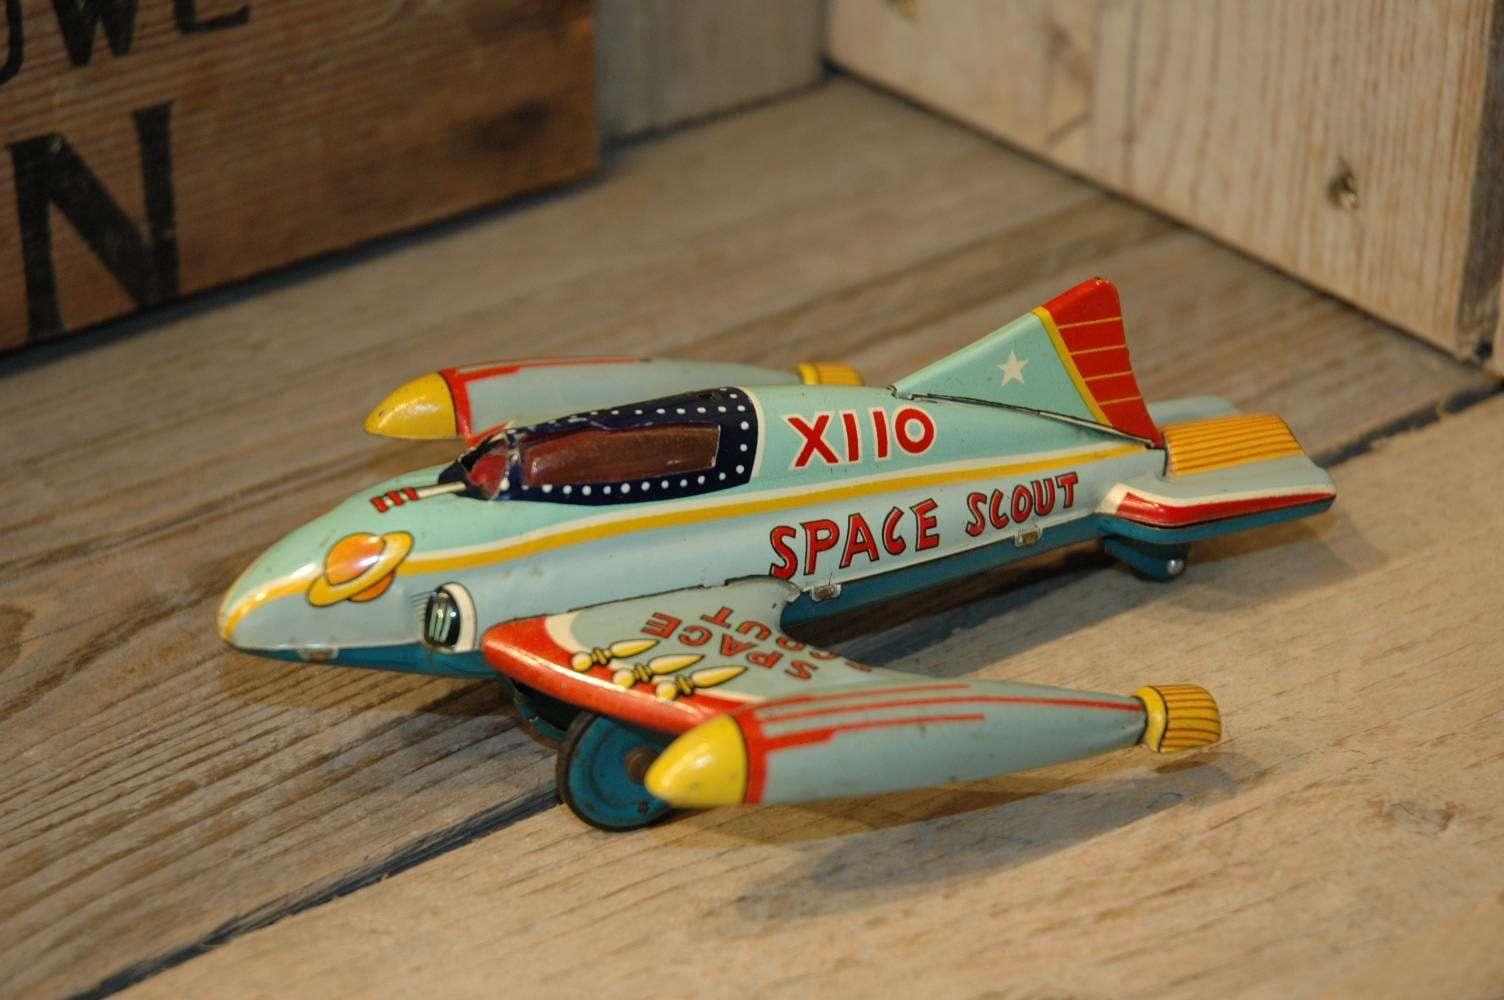 Kamiya - Space Scout X-110